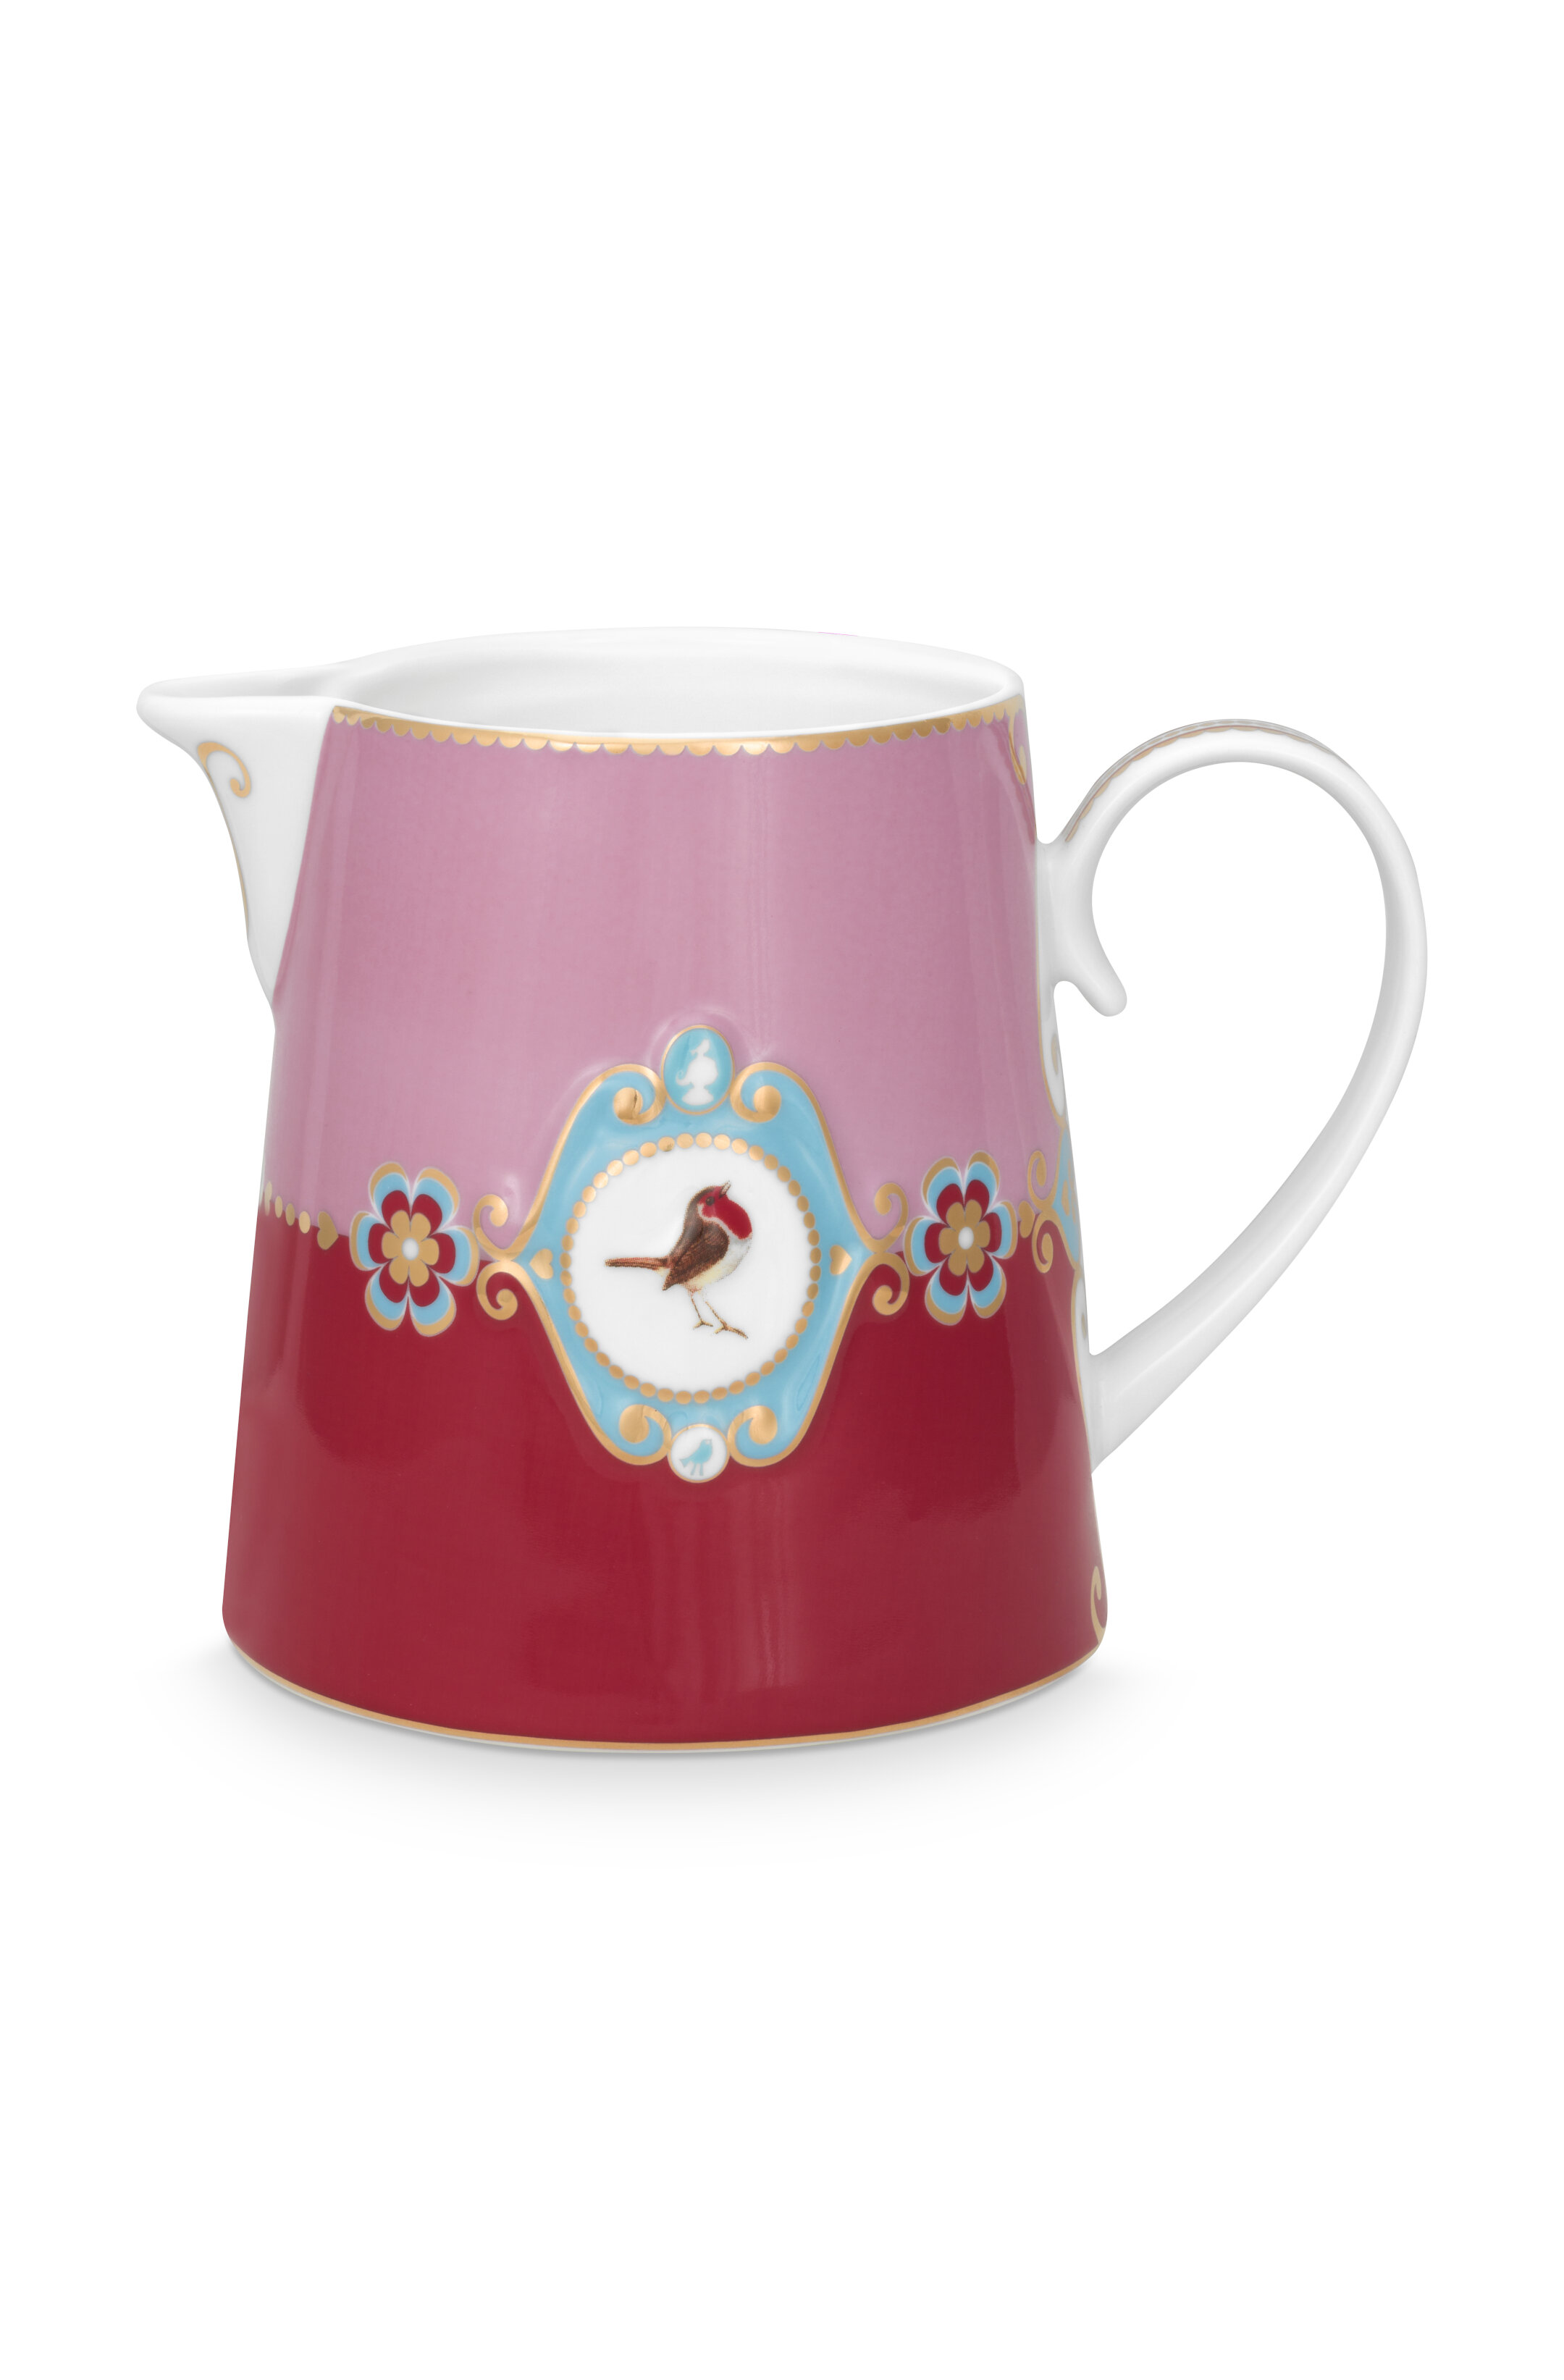 Pip Studio Love Birds Kanne Groß Medaillon Red-Pink